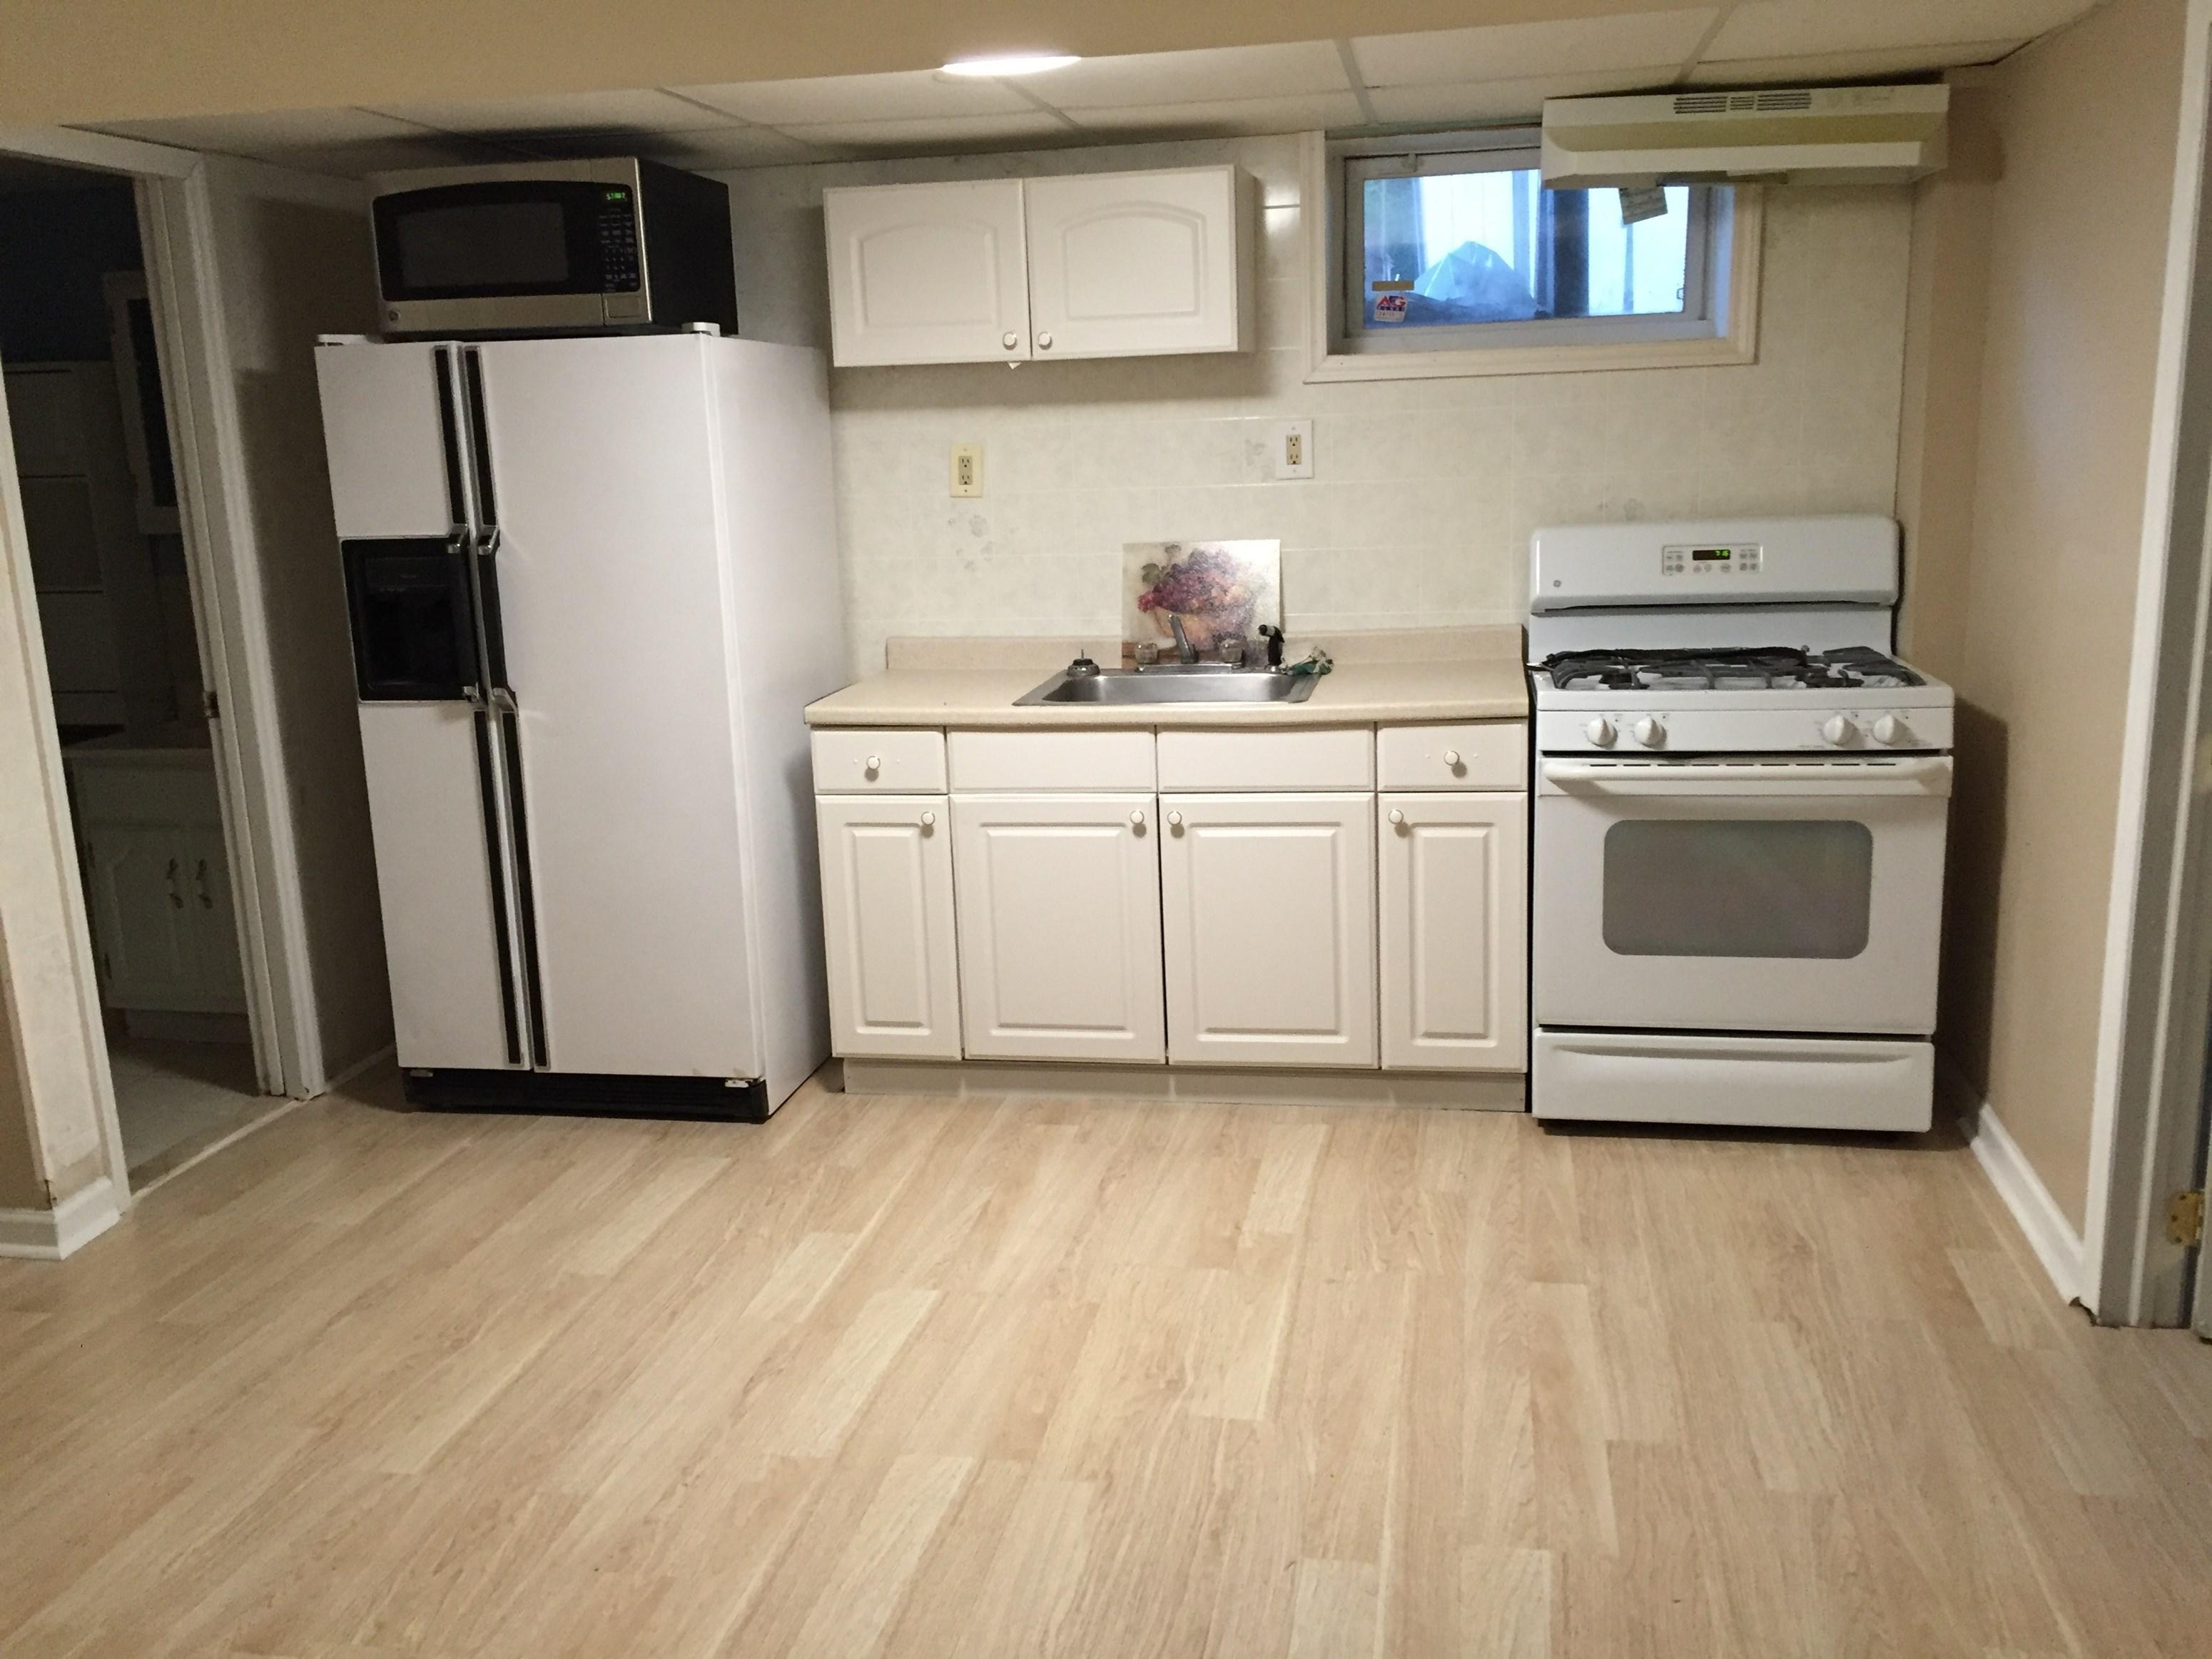 1 Br Apartments For Rent In Philadelphia Apartments Garden Court